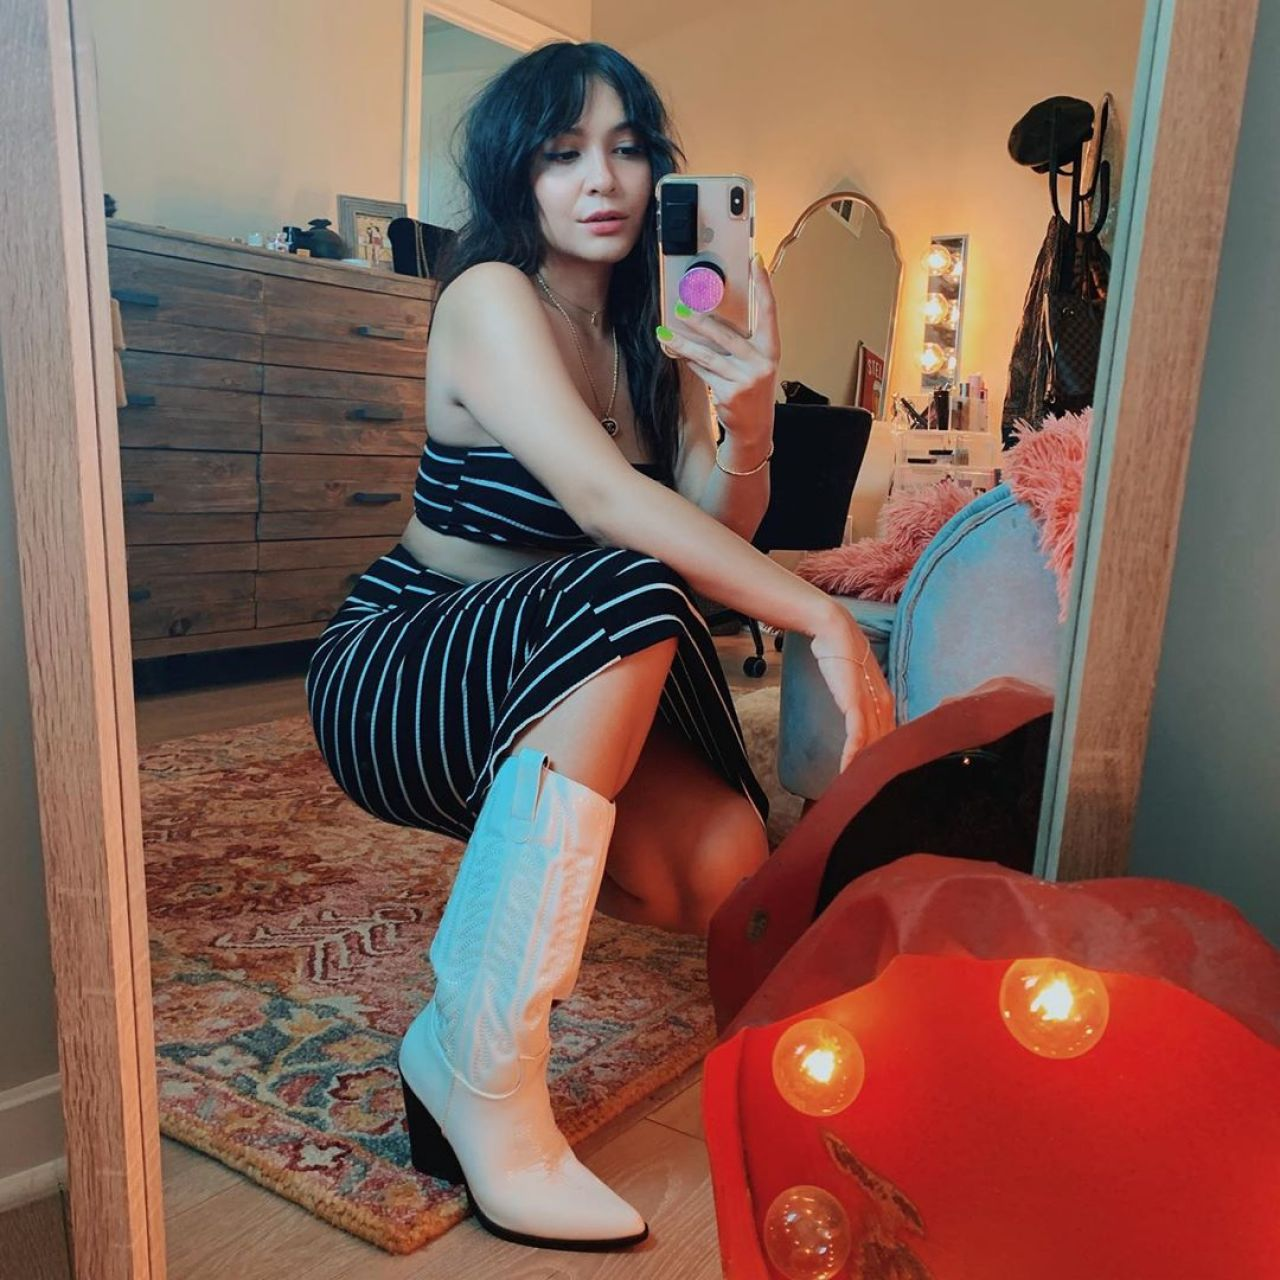 Andrea Londo Nua stella hudgens – social media 07/11/2019